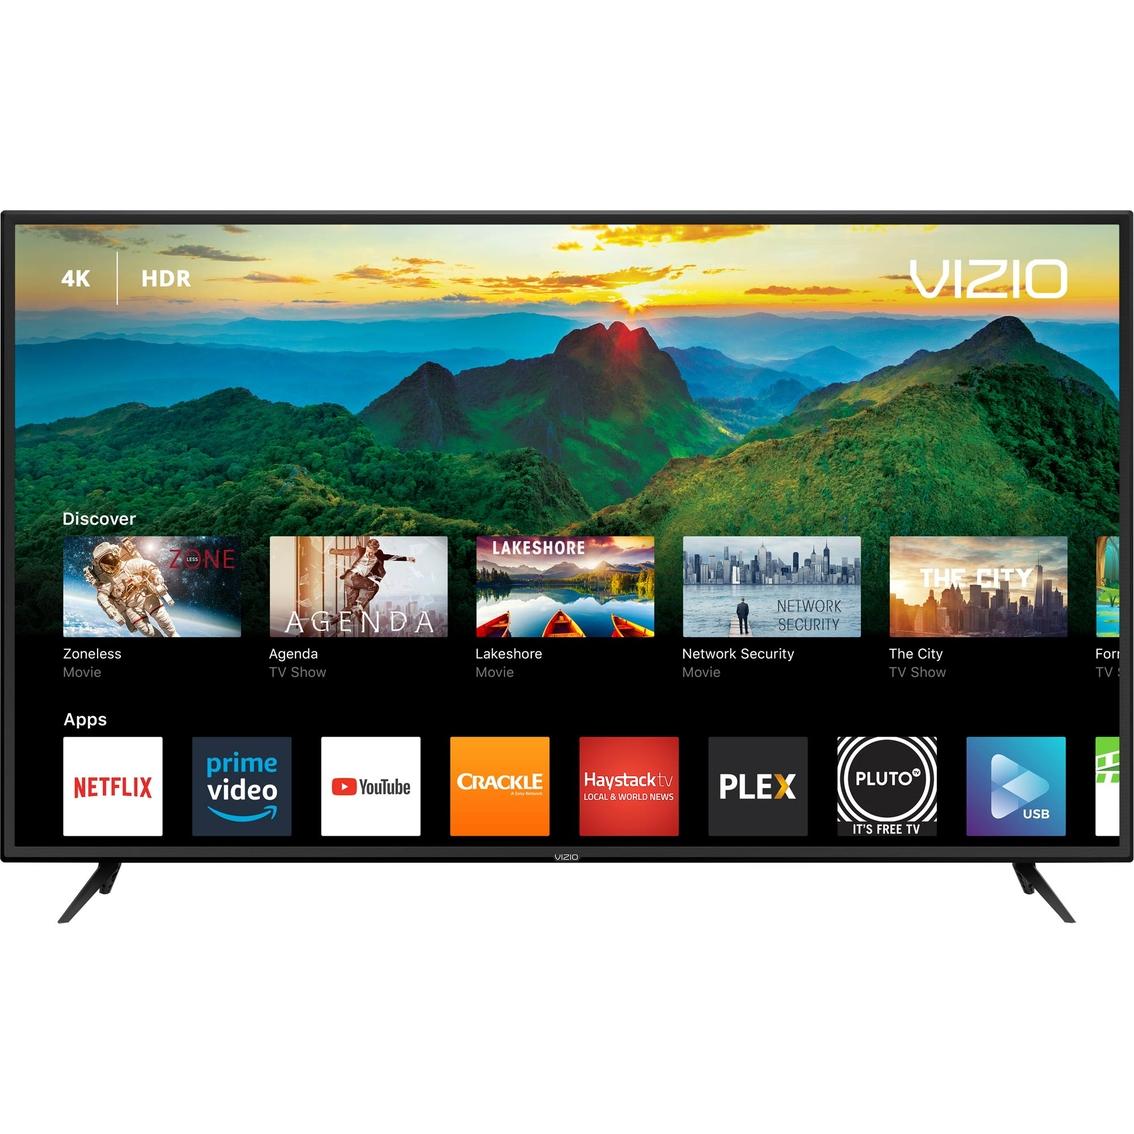 Vizio 70 In  4k Hdr 120hz Smart Tv D70f3 | Tvs | Electronics